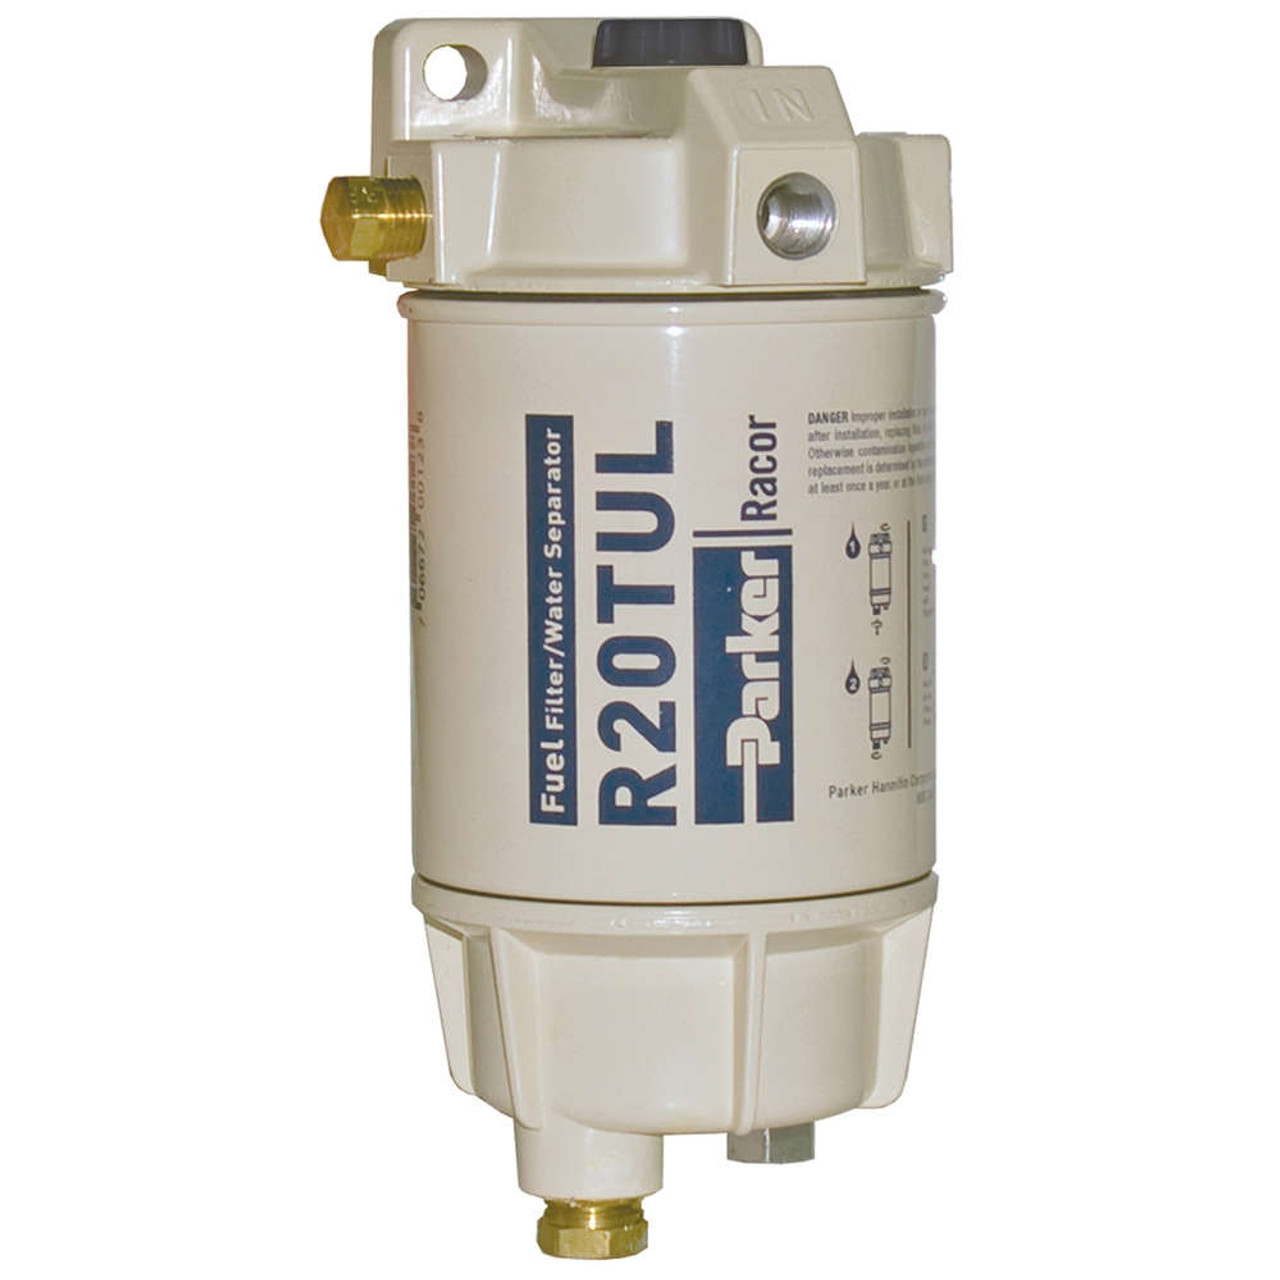 Racor 1/4 in. 30 GPH Aquabloc Marine Spin-On Type Diesel Fuel